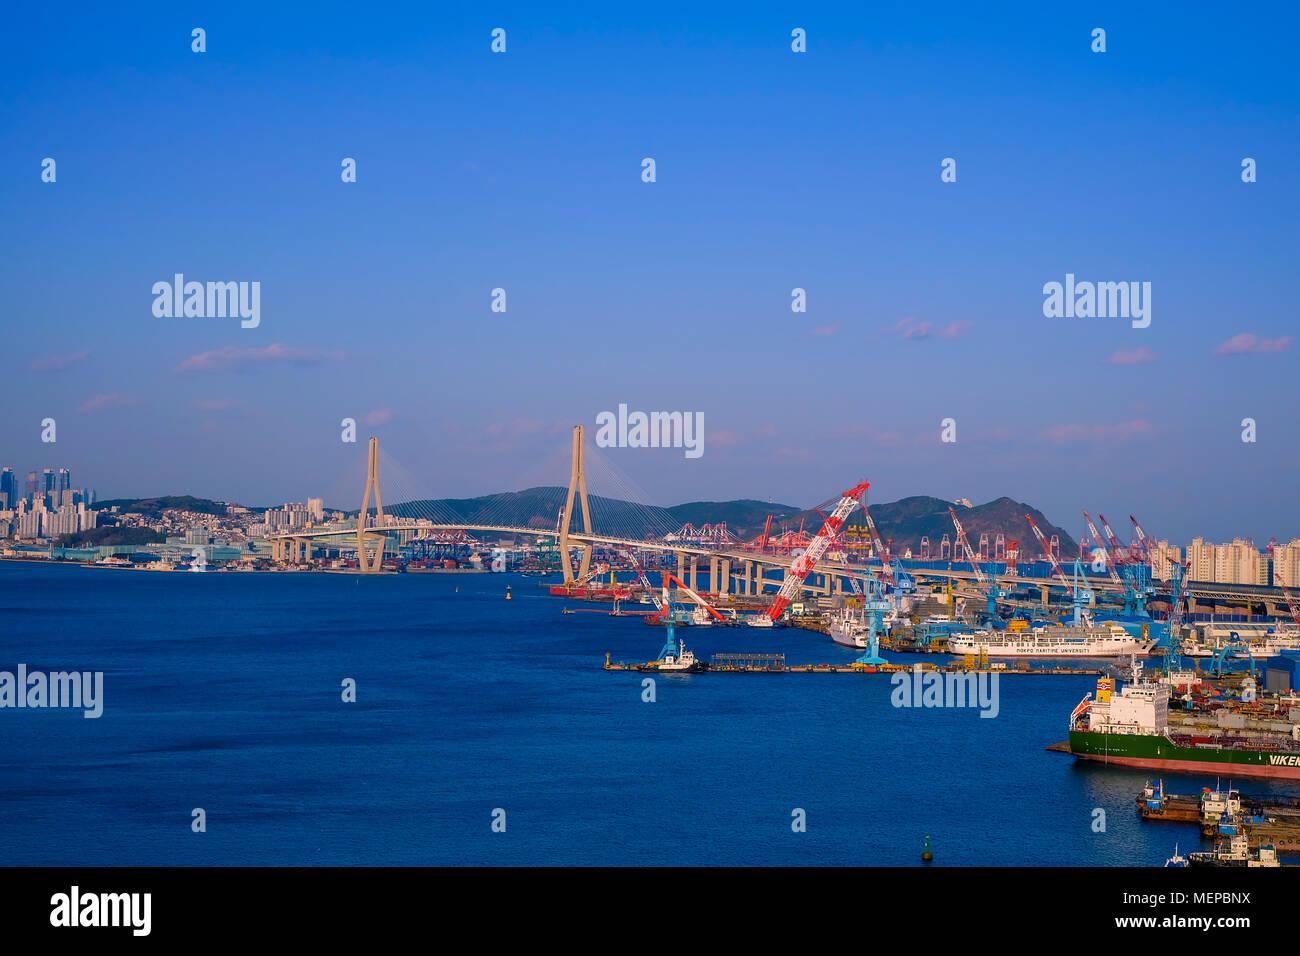 Aerial view of Busan port, South Korea. Stock Photo